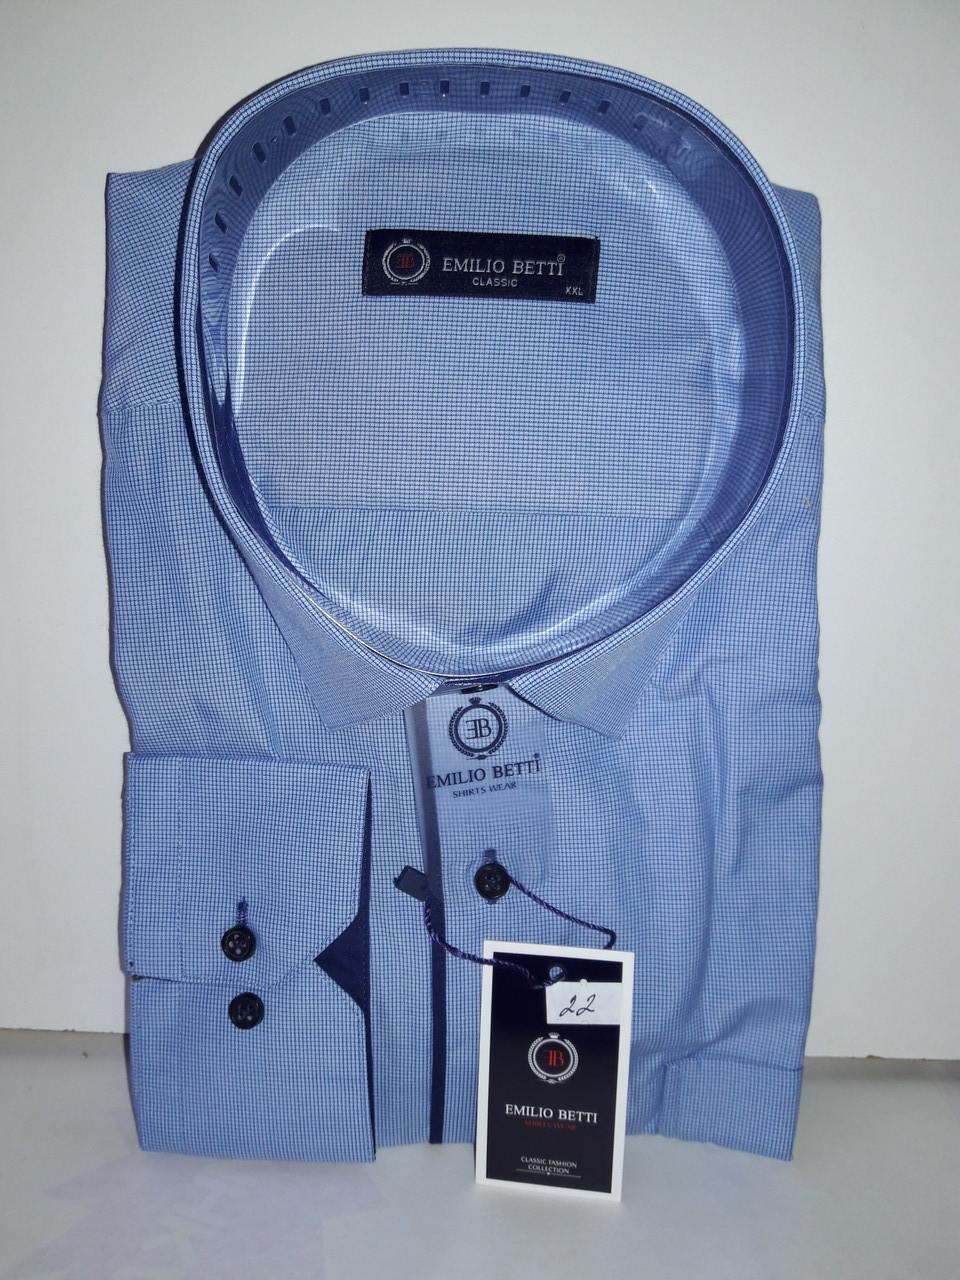 de8229721de Рубашка Emilio Betti - Магазин Рубашек VIK в Запорожье